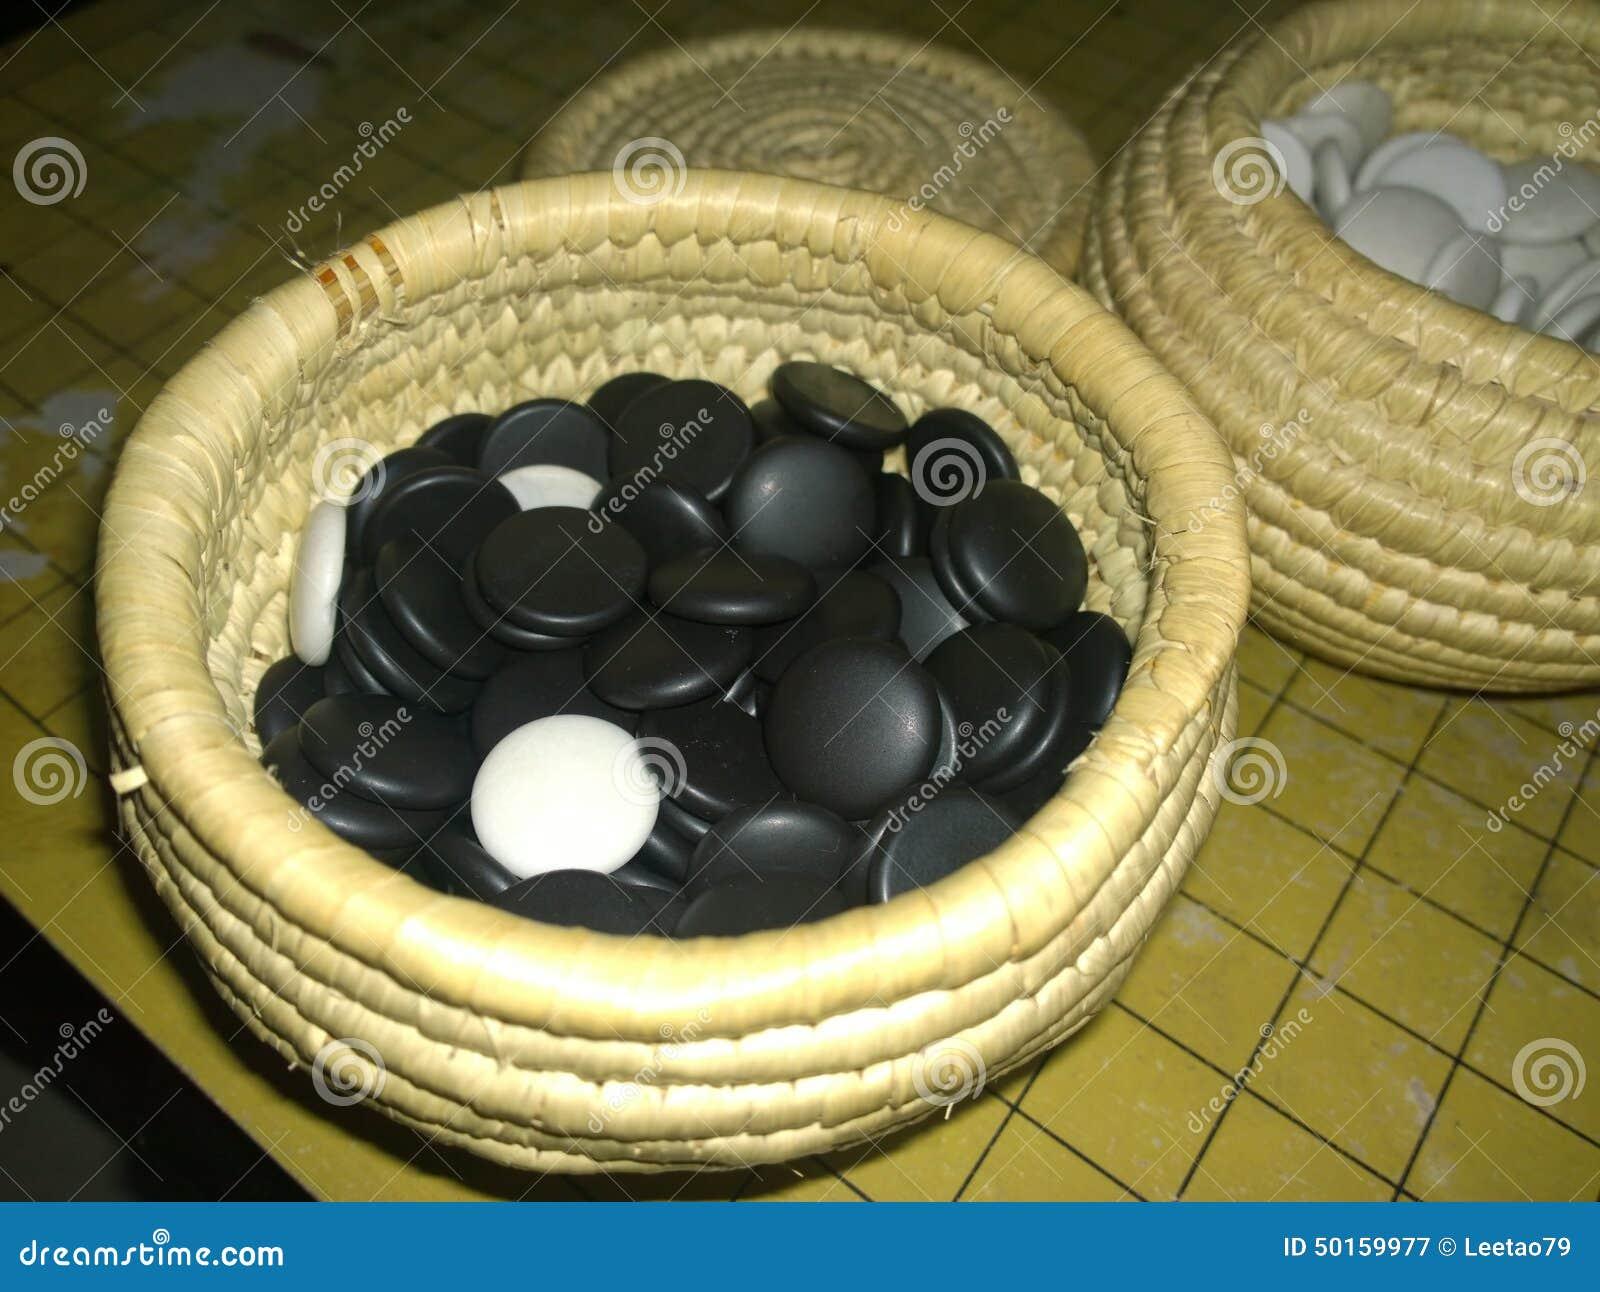 Go stock image  Image of belongs, civilization, alternating - 50159977